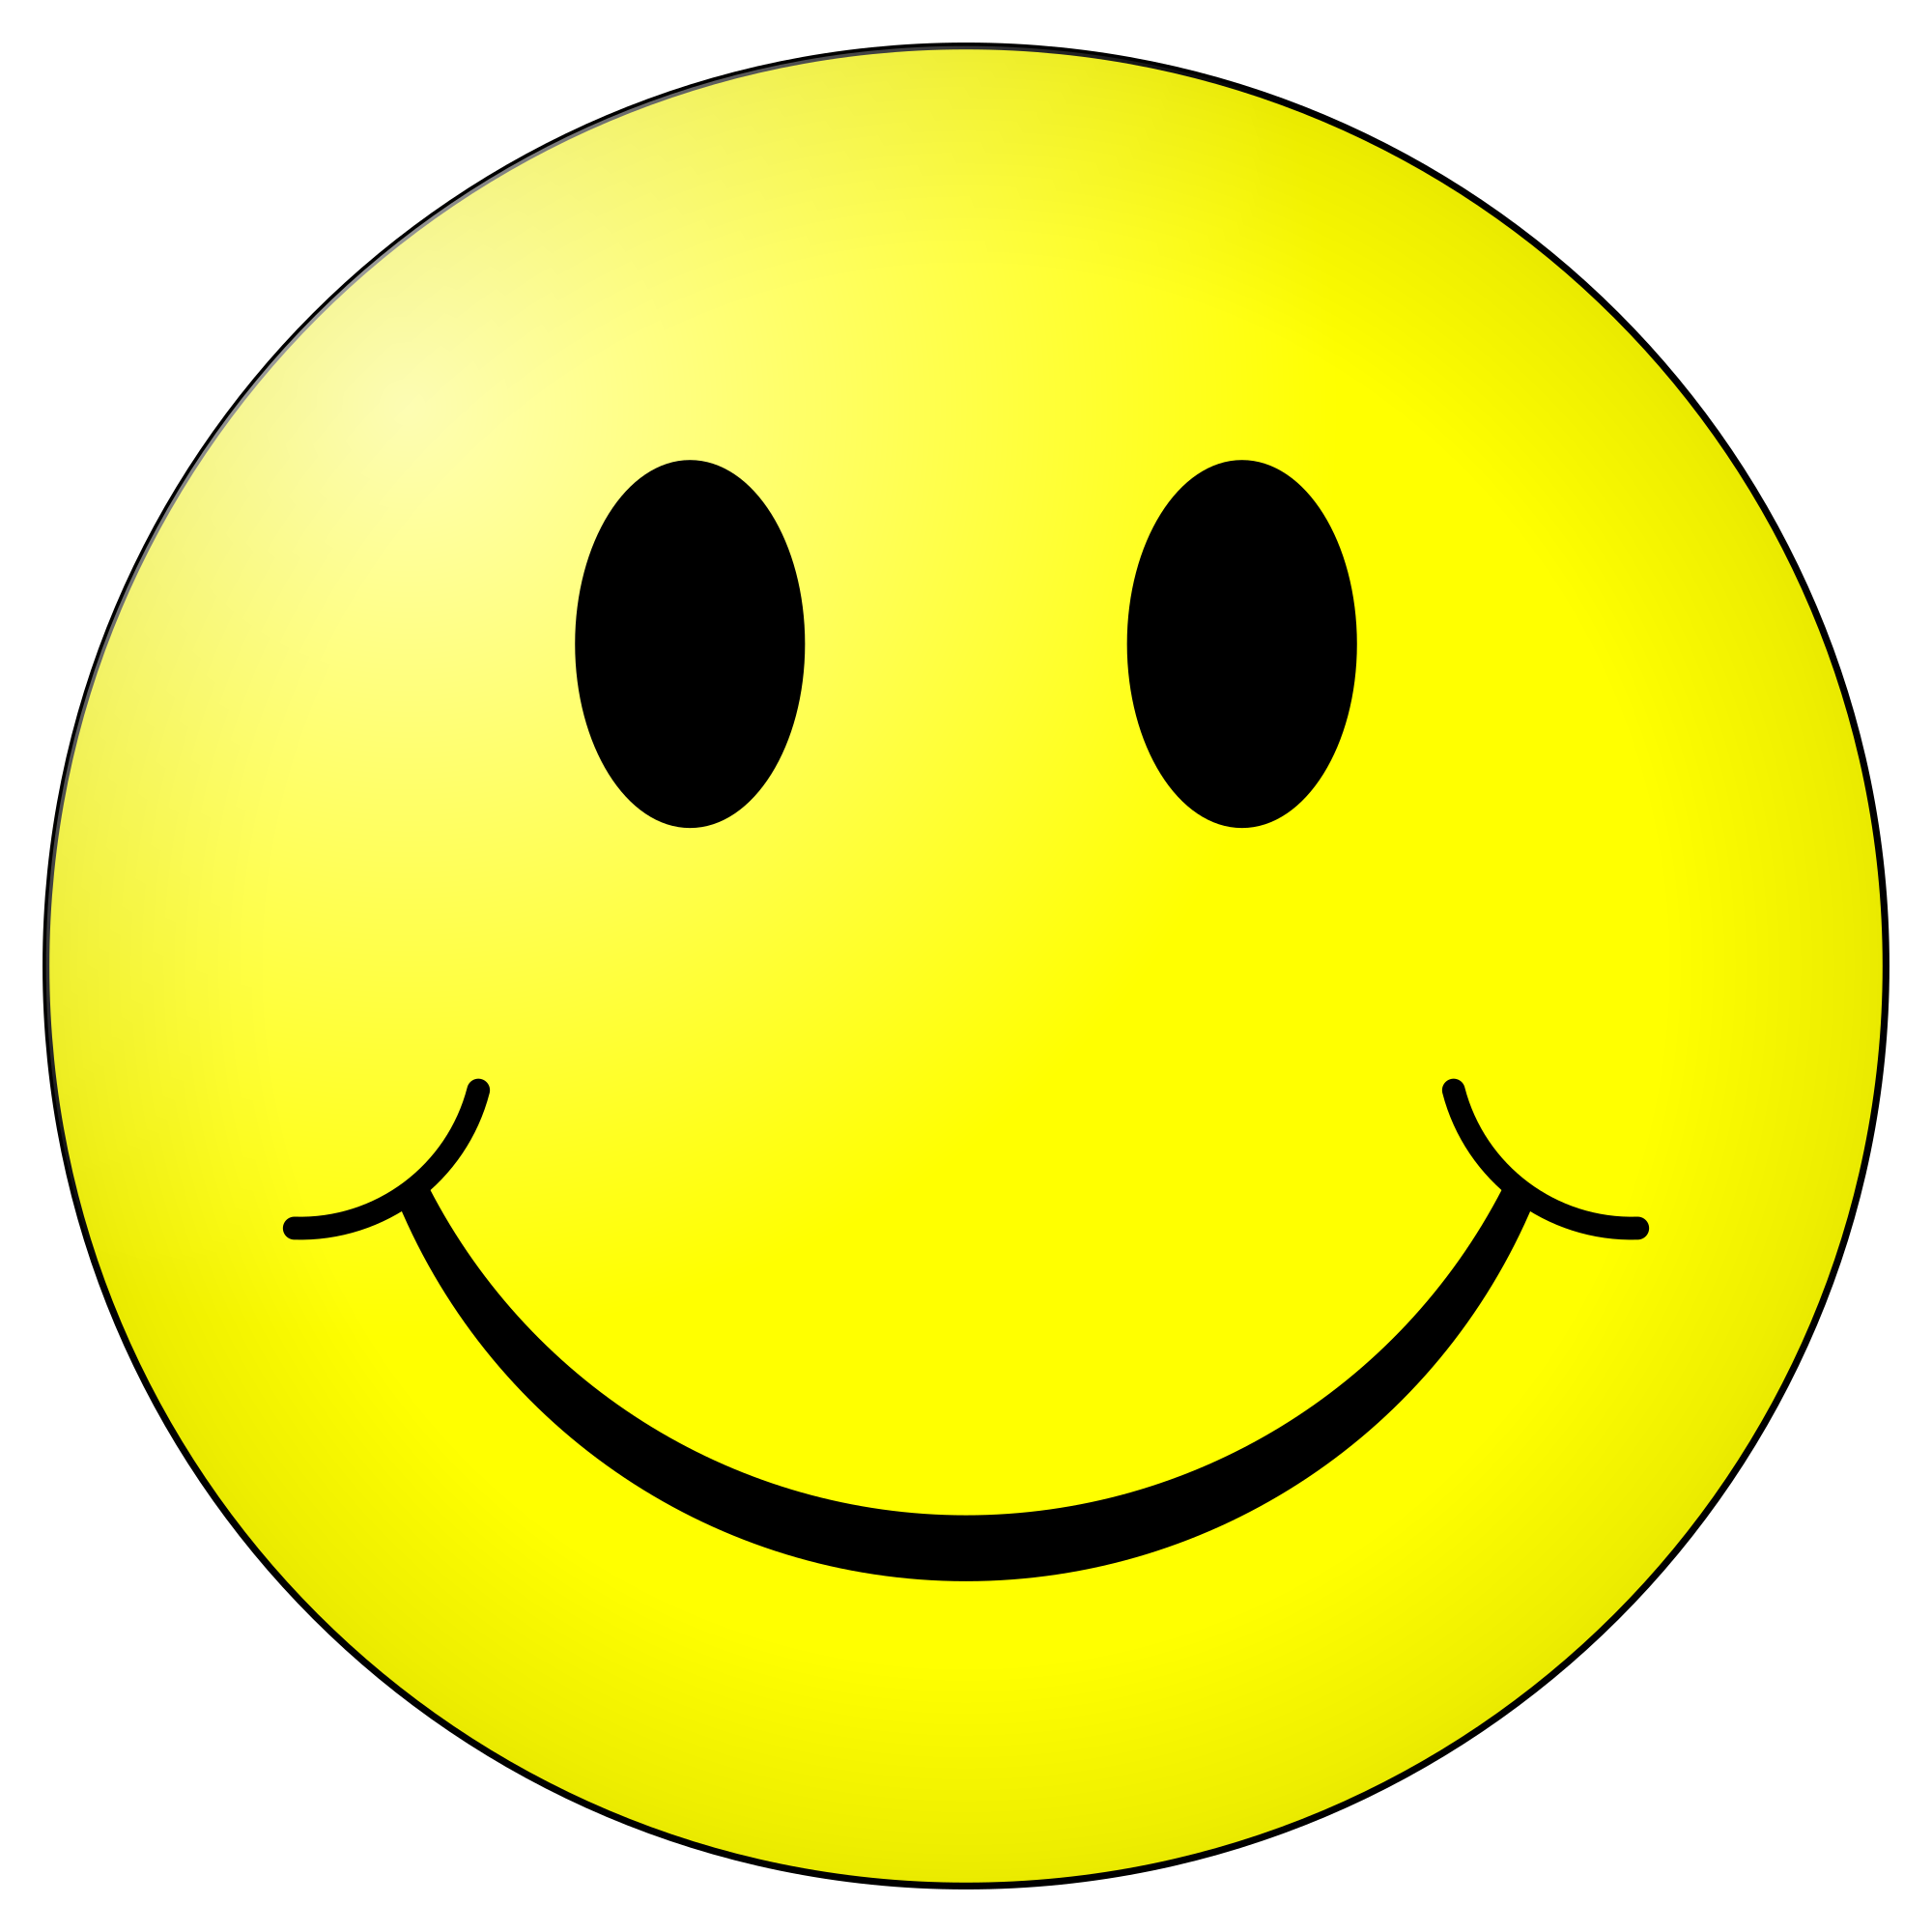 jpg black and white stock smiley transparent #87768559